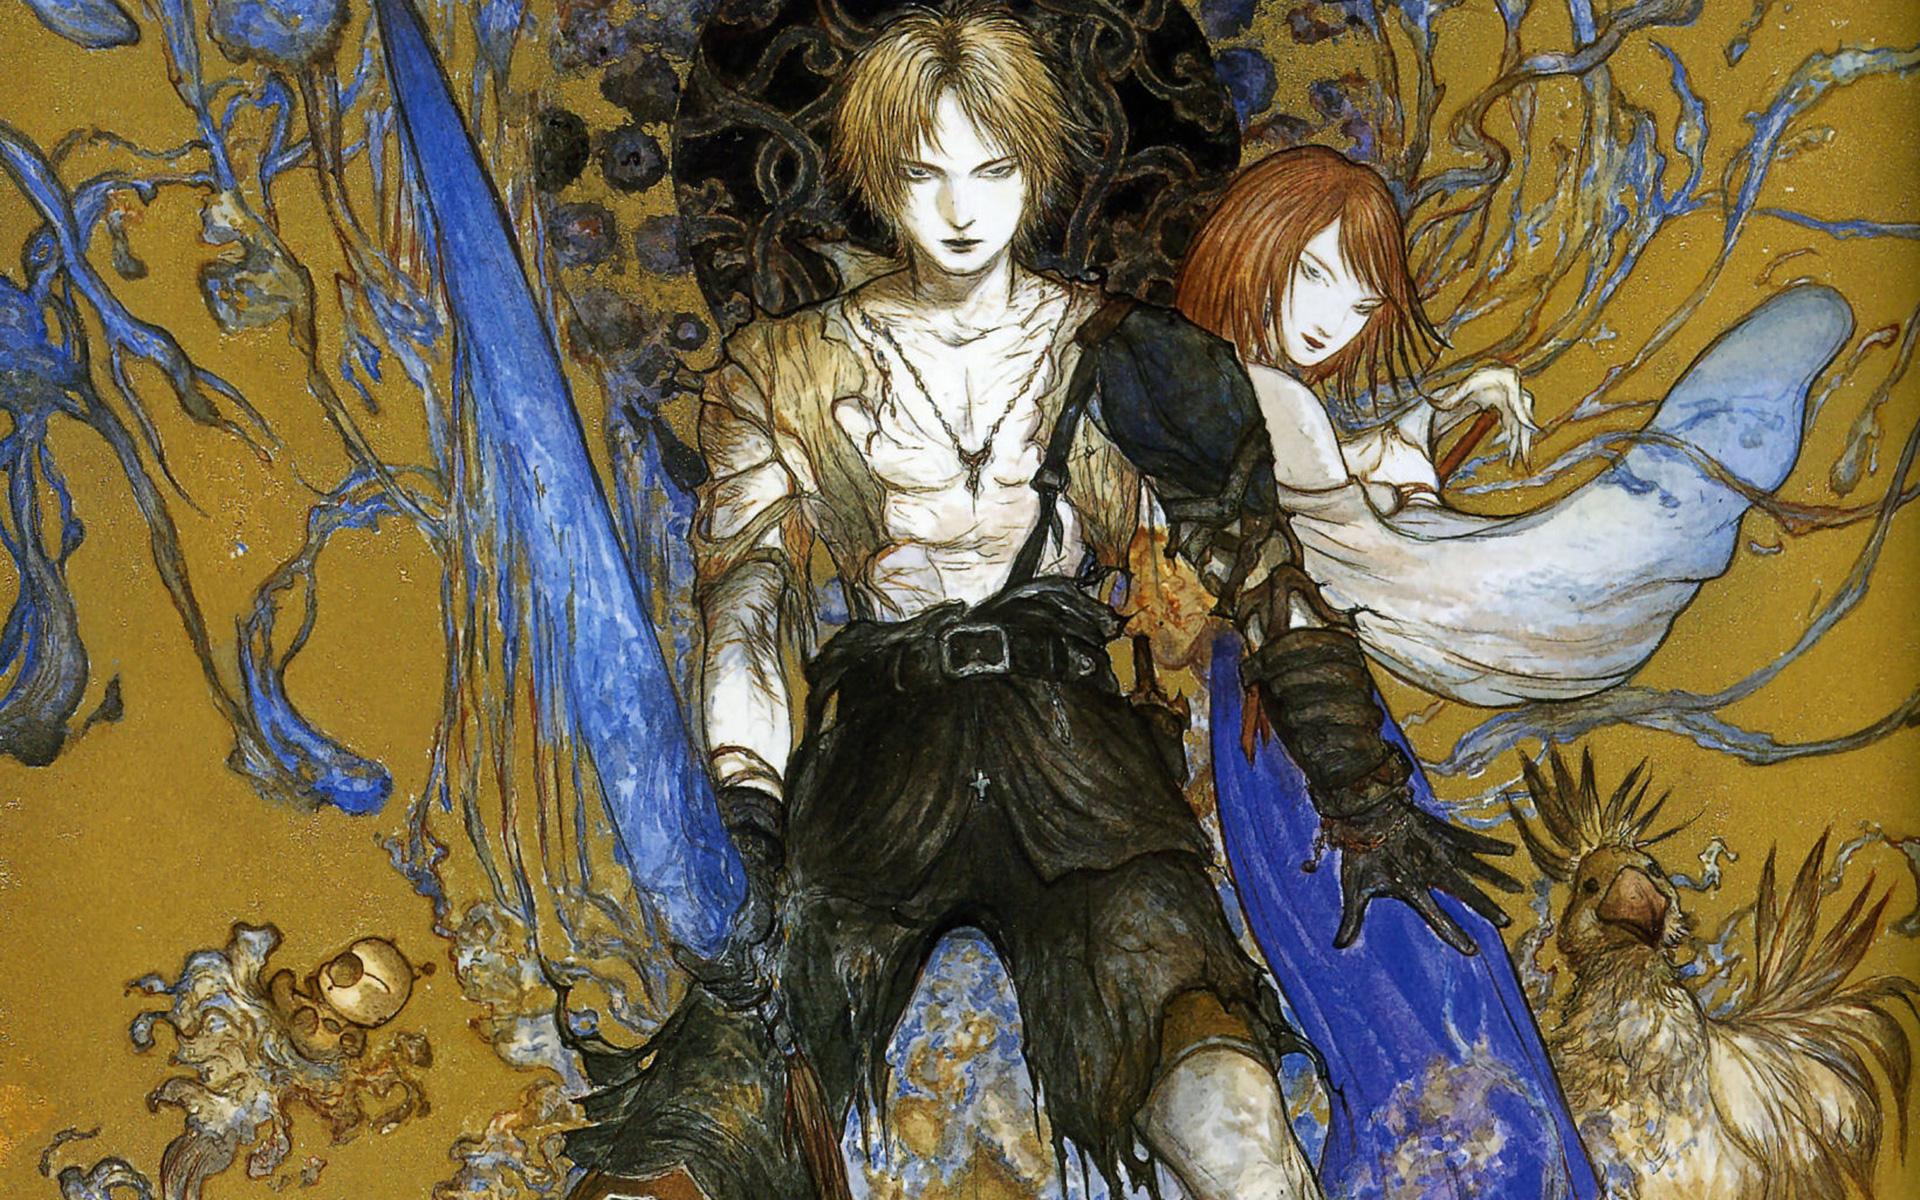 Free Final Fantasy X Wallpaper in 1920x1200